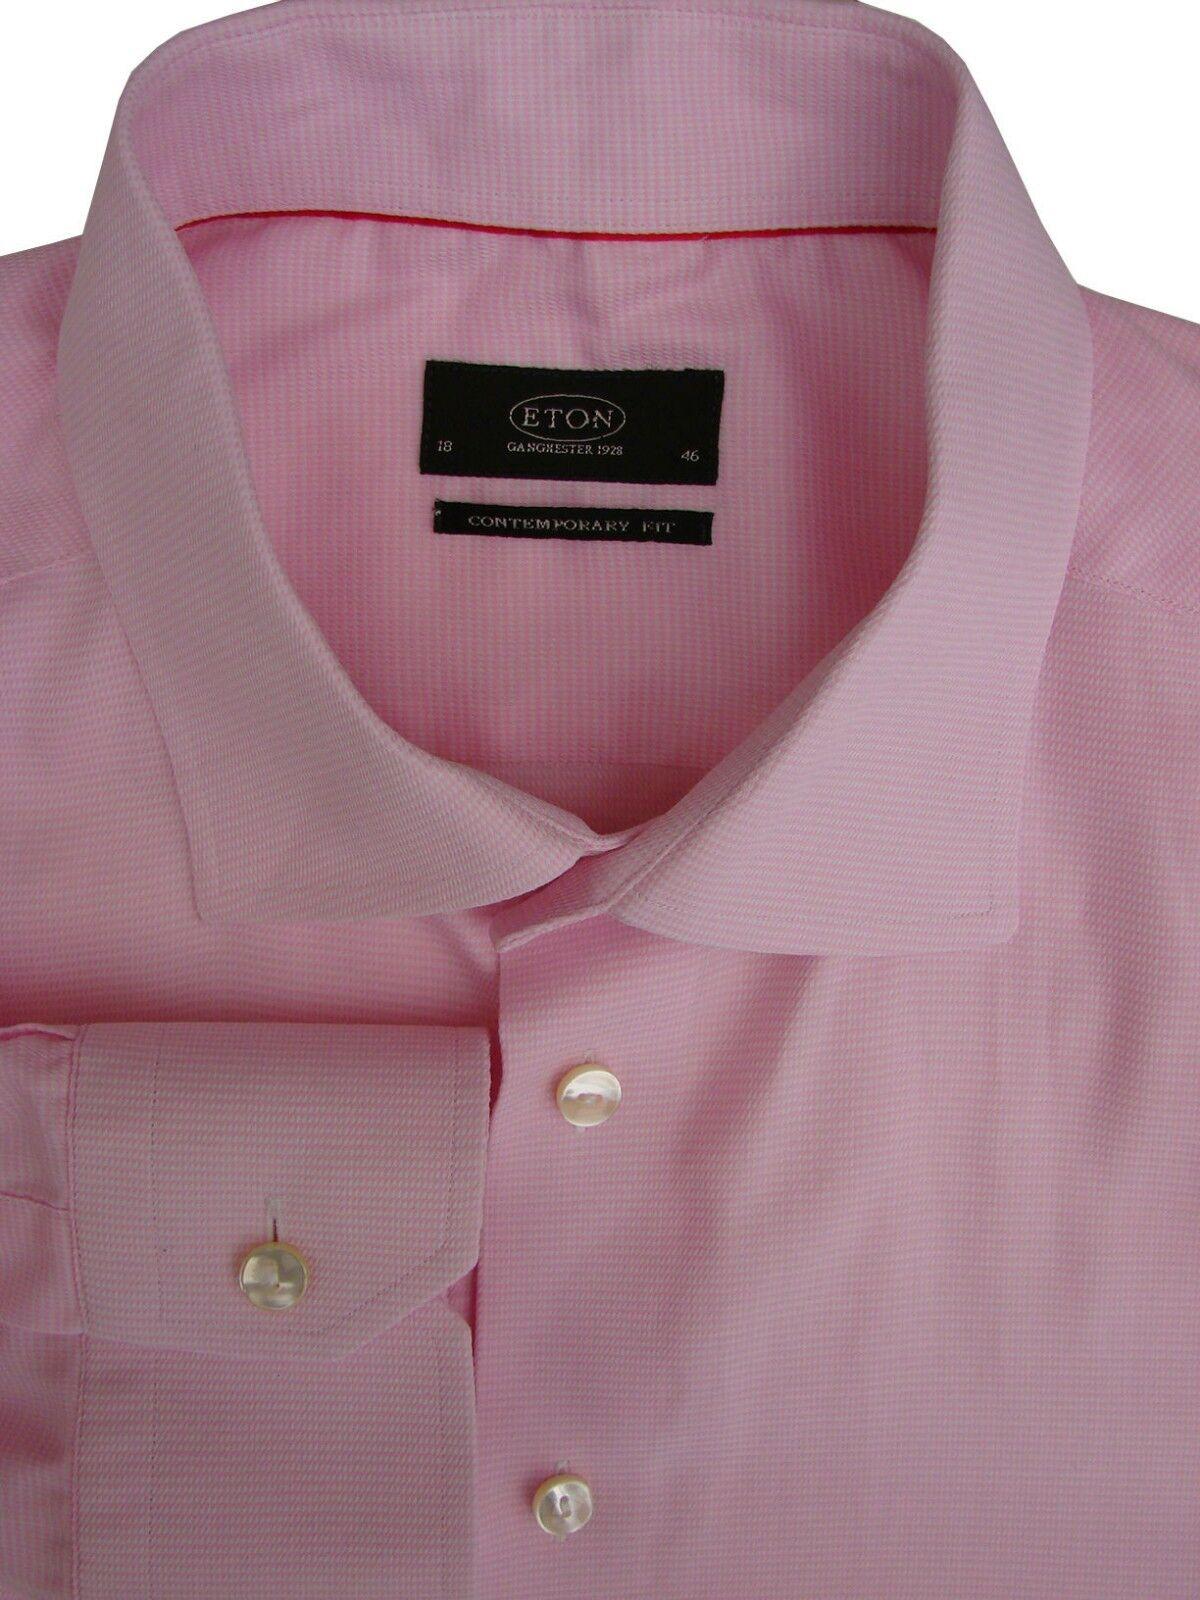 ETON CONTEMPORARY Shirt Mens 18 L Pink & White Mini Houndstooth